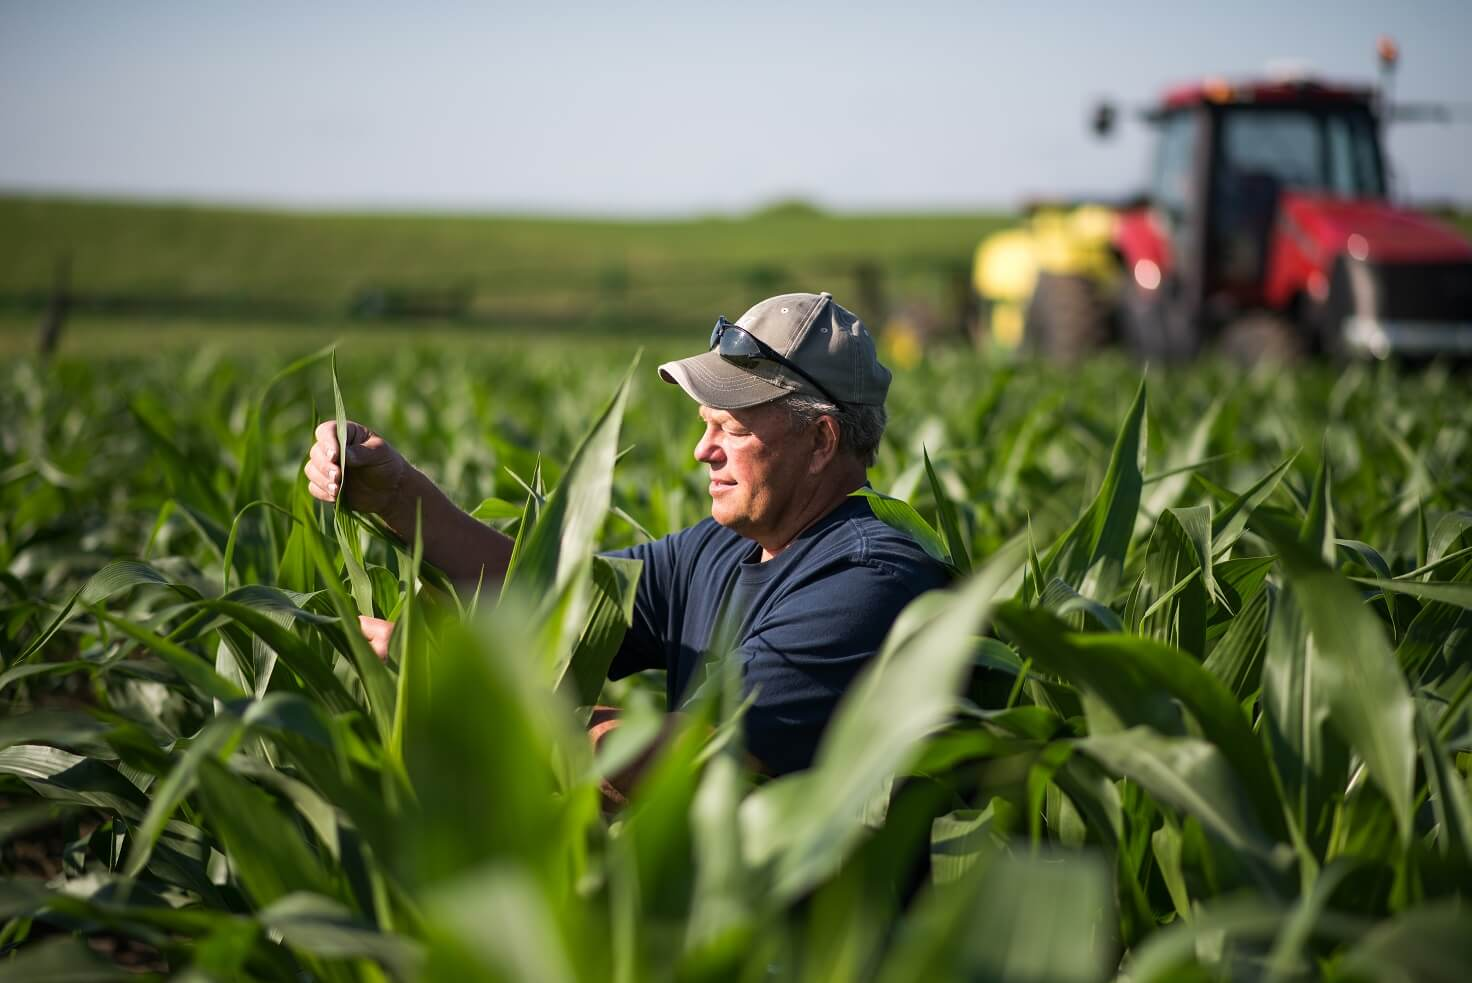 The 2019 Innovation Grant Program RFP is open for Minnesota's corn